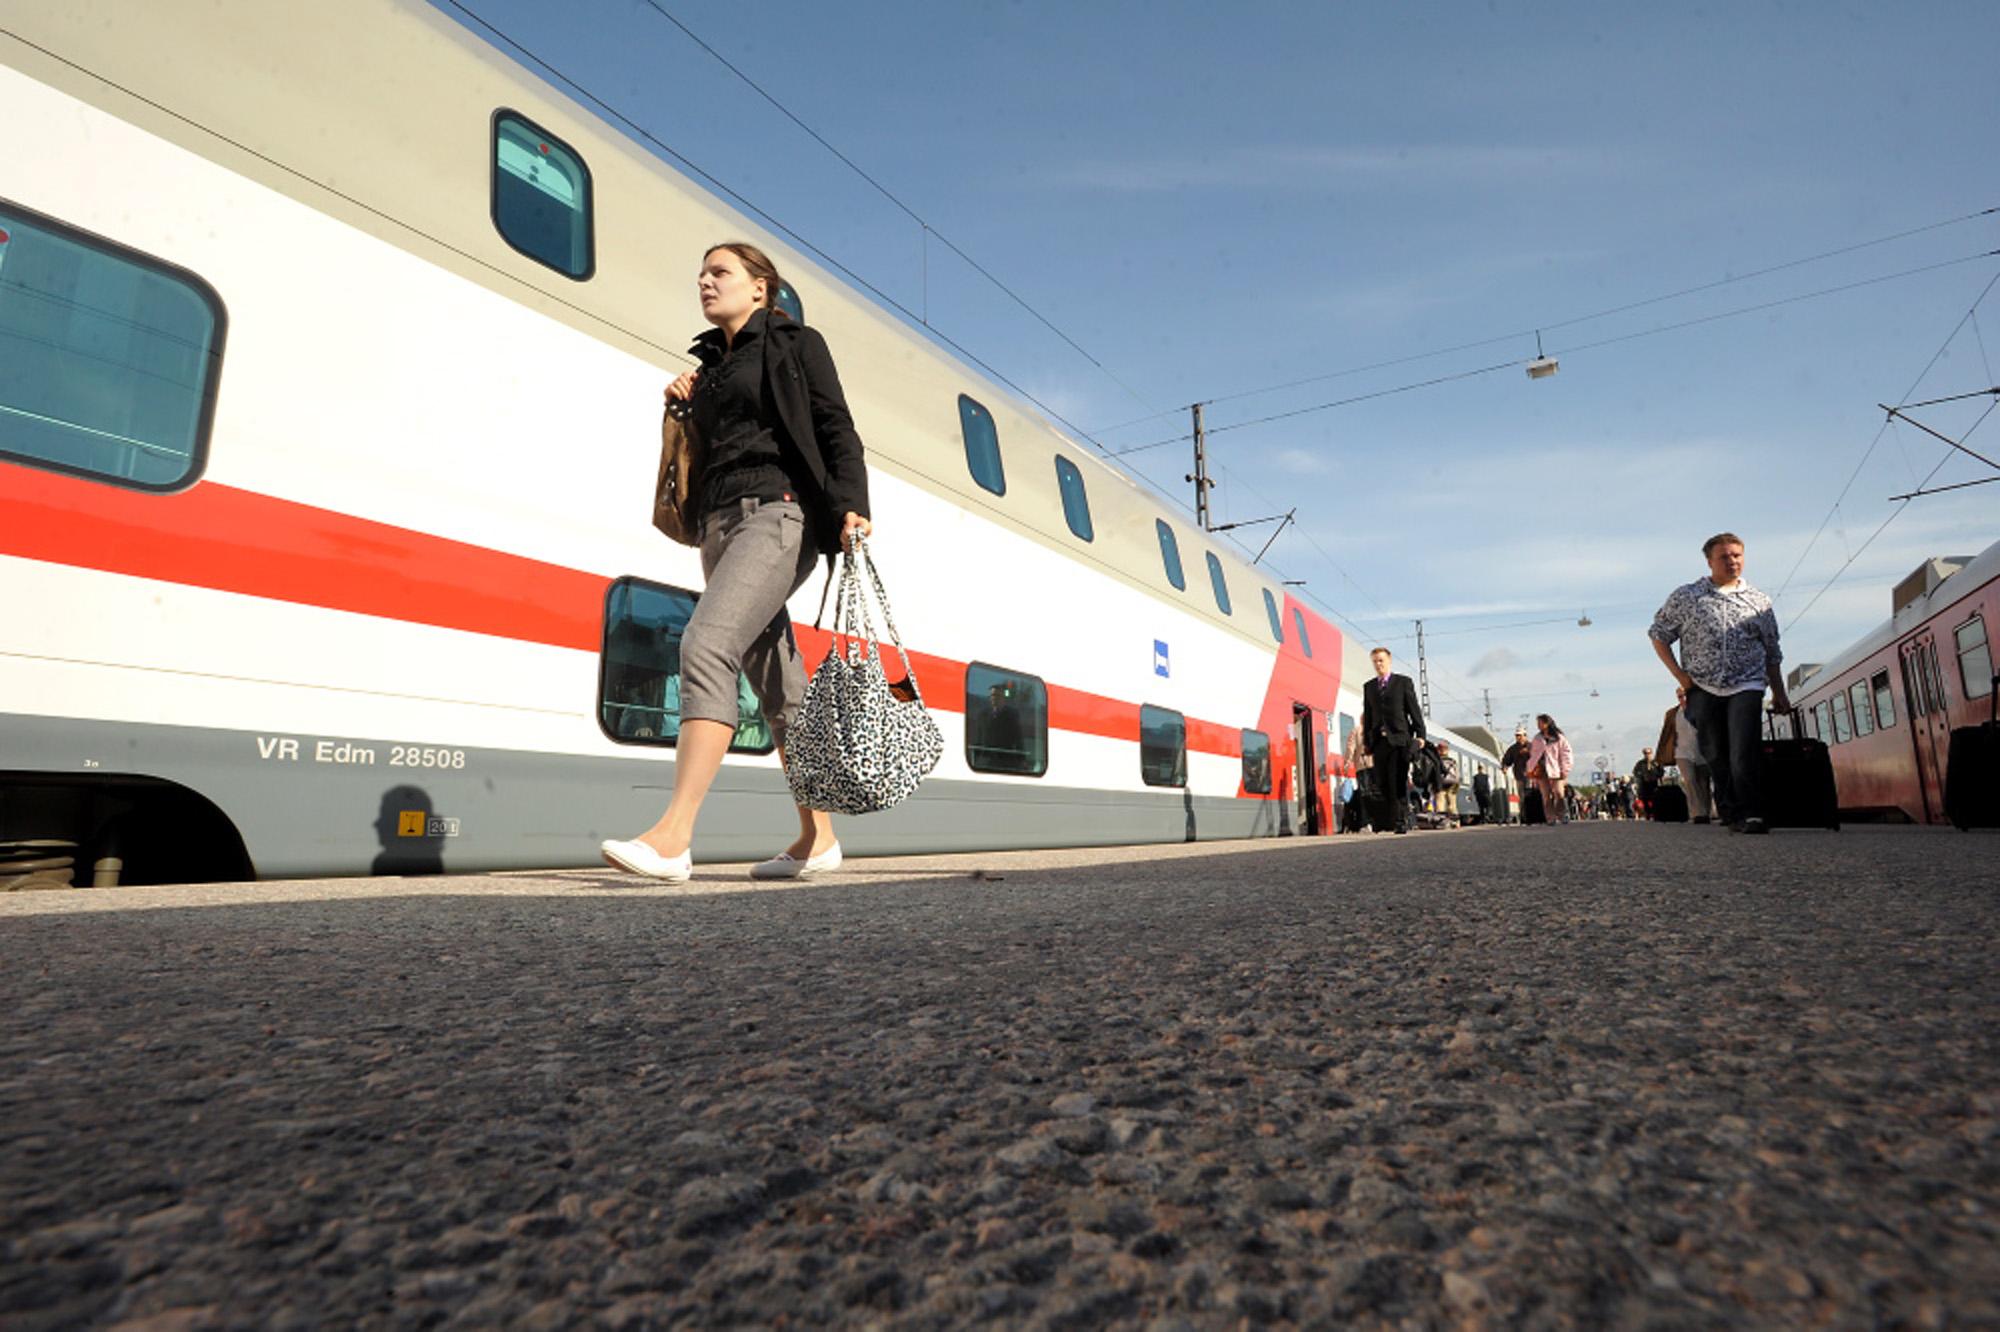 Rautatieliikennejuna makuuvaunu matkustaja vr asema